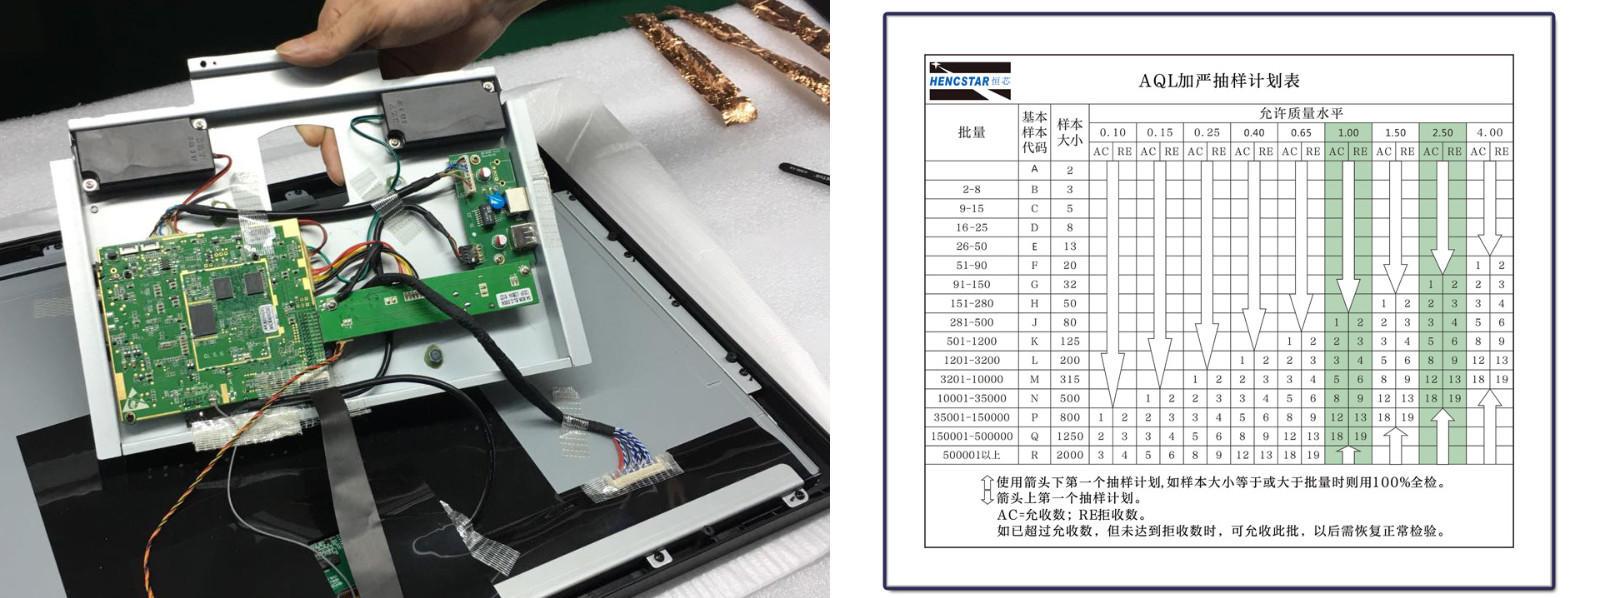 Hengstar Brand industrial industrial touch screen display usb supplier